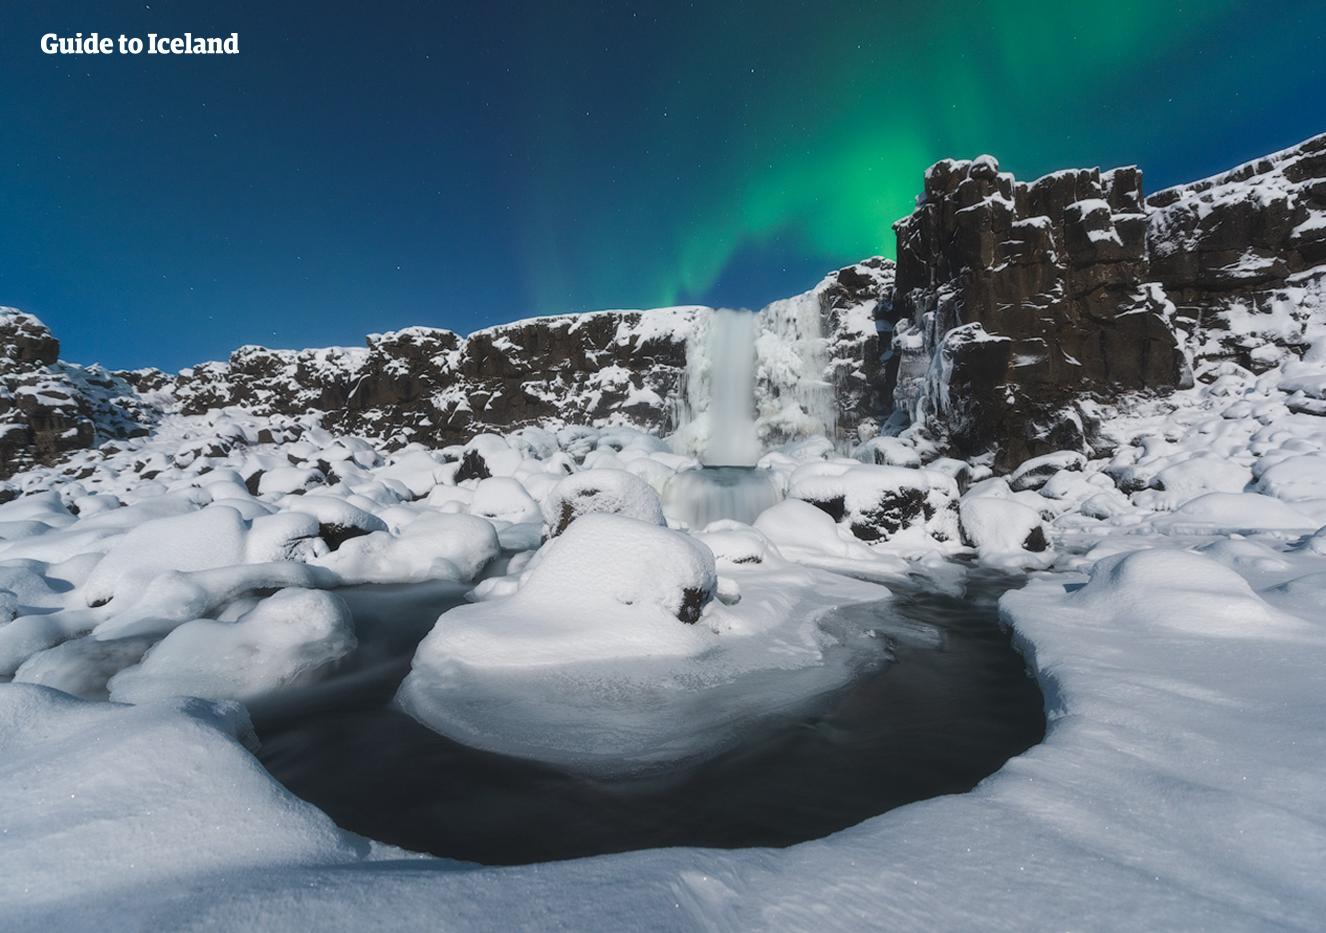 Der Wasserfall Öxararfoss im schneebedeckten Thingvellir-Nationalpark im Winter.